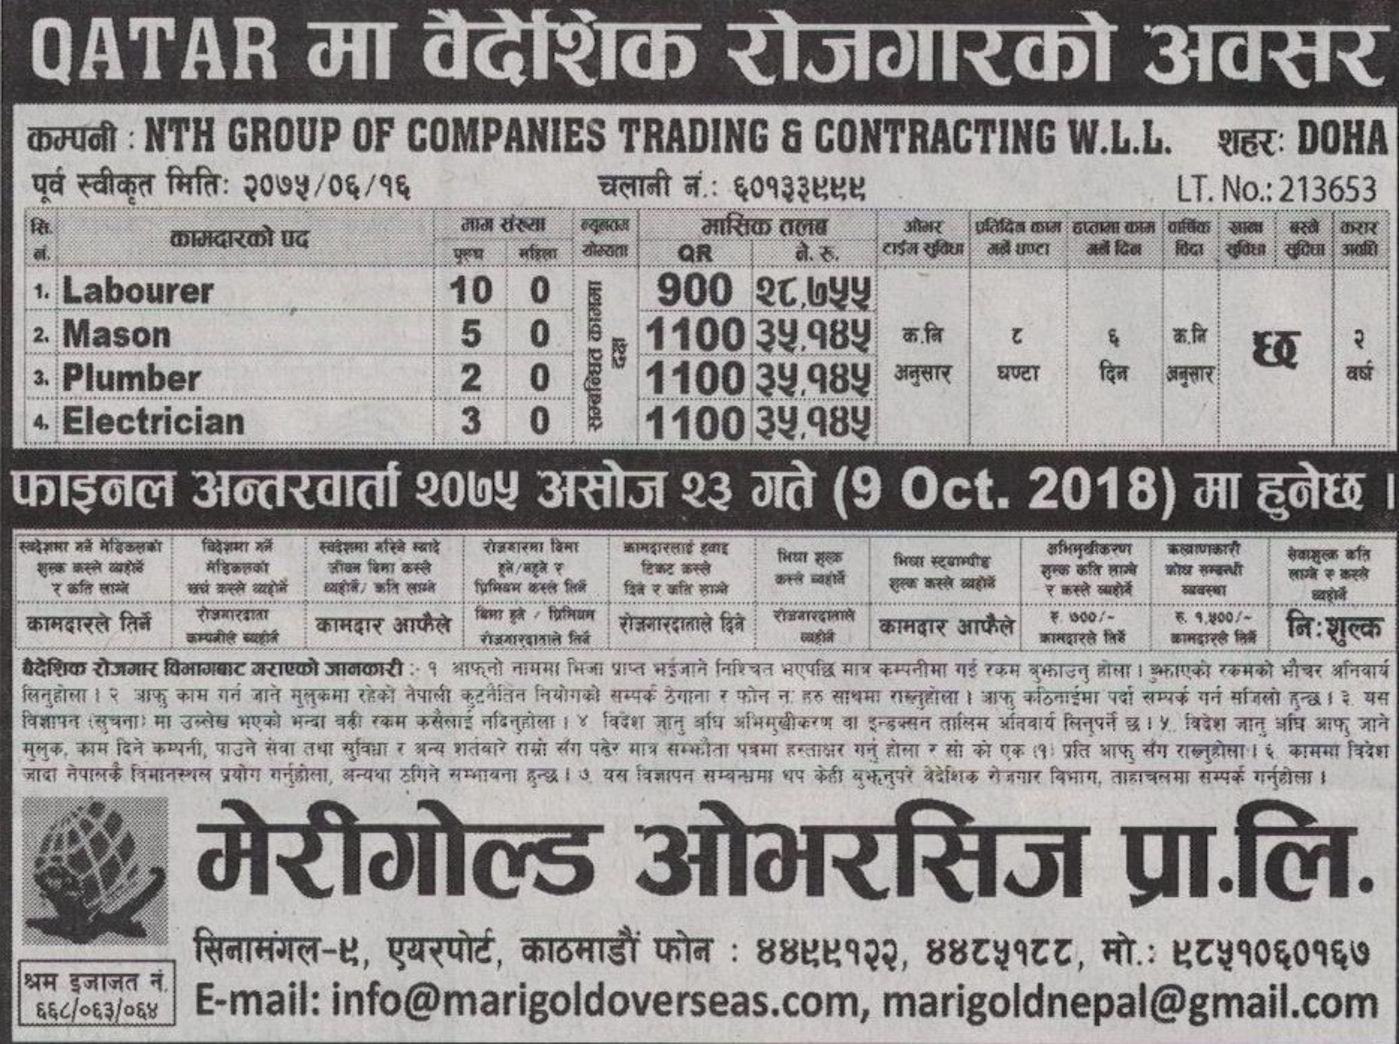 Jobs Nepal - Vacancy - Laborer, Mason, Plumber, Electrician - Nth